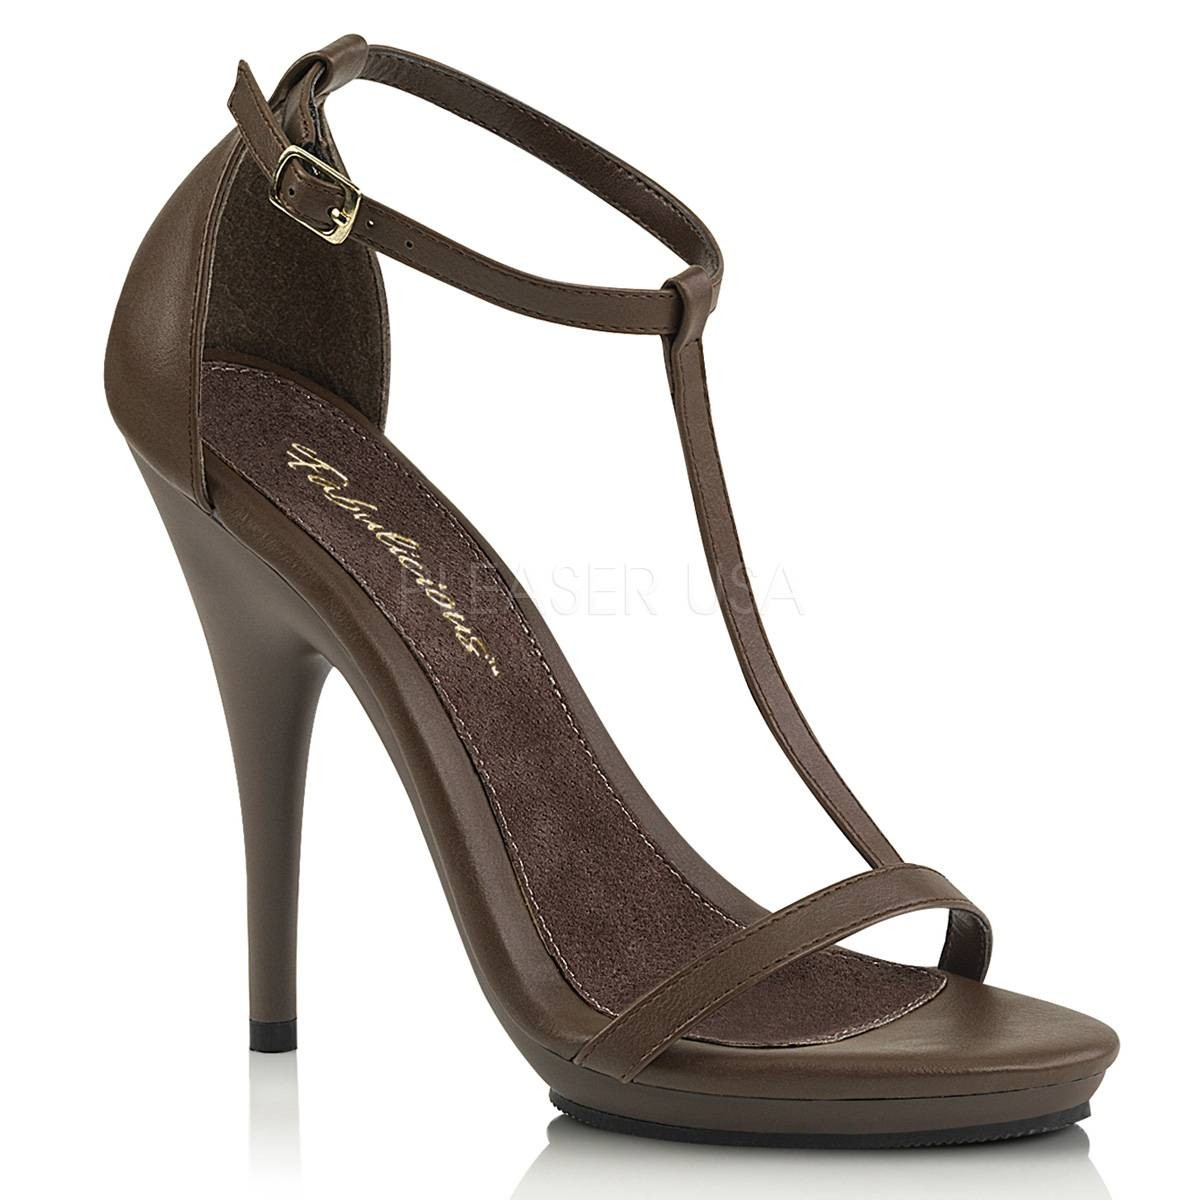 Sandalen - POISE 526 ° Damen Sandalette ° BraunMatt ° Fabulicious  - Onlineshop RedSixty